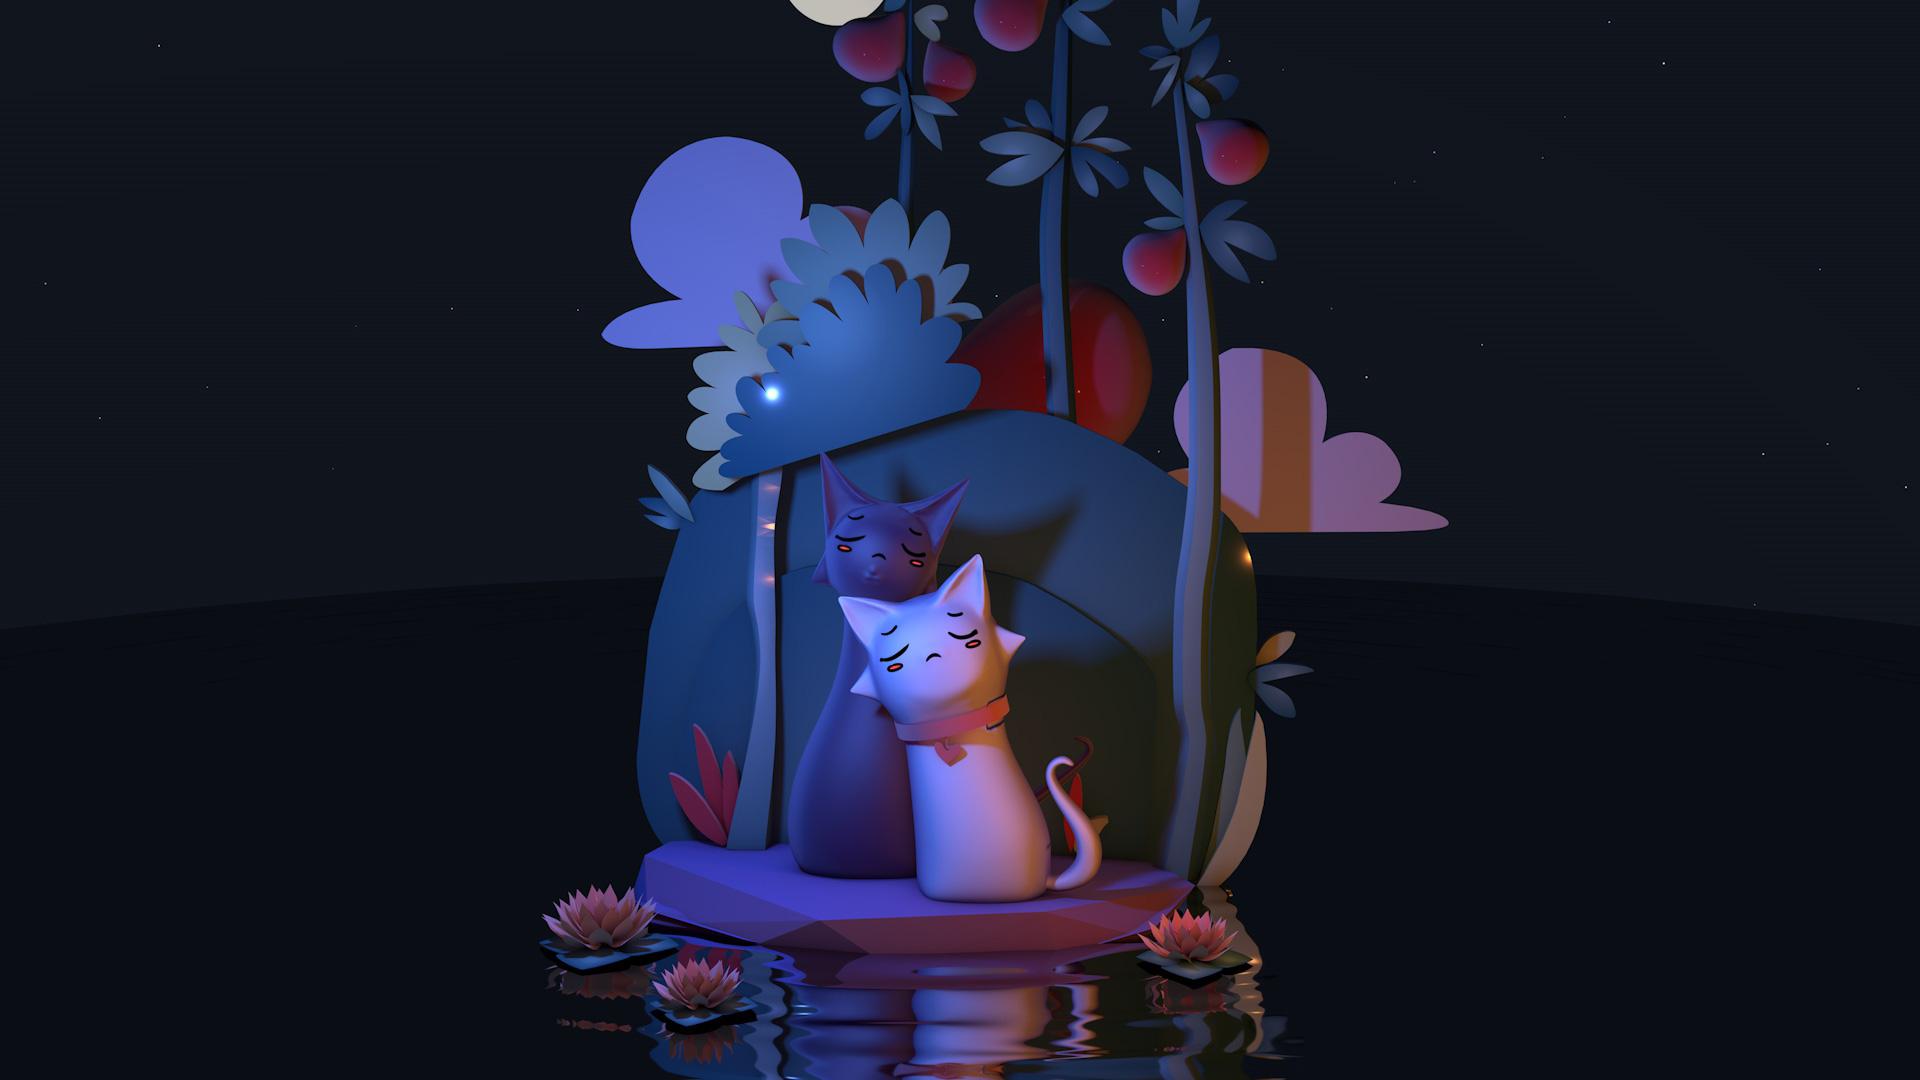 C4D模型梦幻森林精灵猫咪荷塘夜色014.jpg